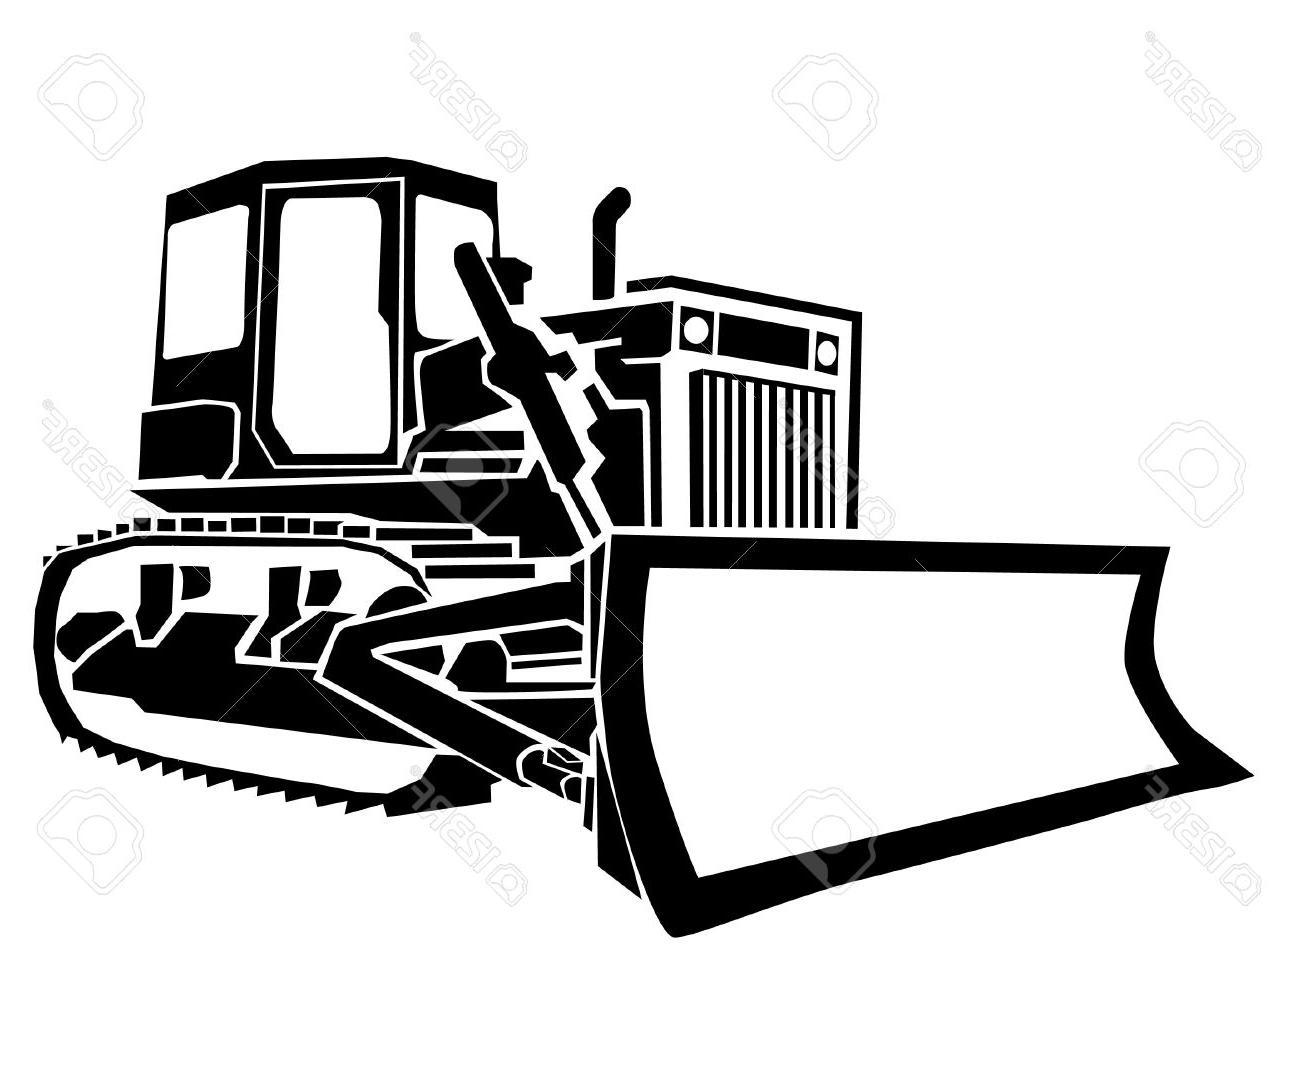 Bulldozer clipart black and white. Dozer free download best